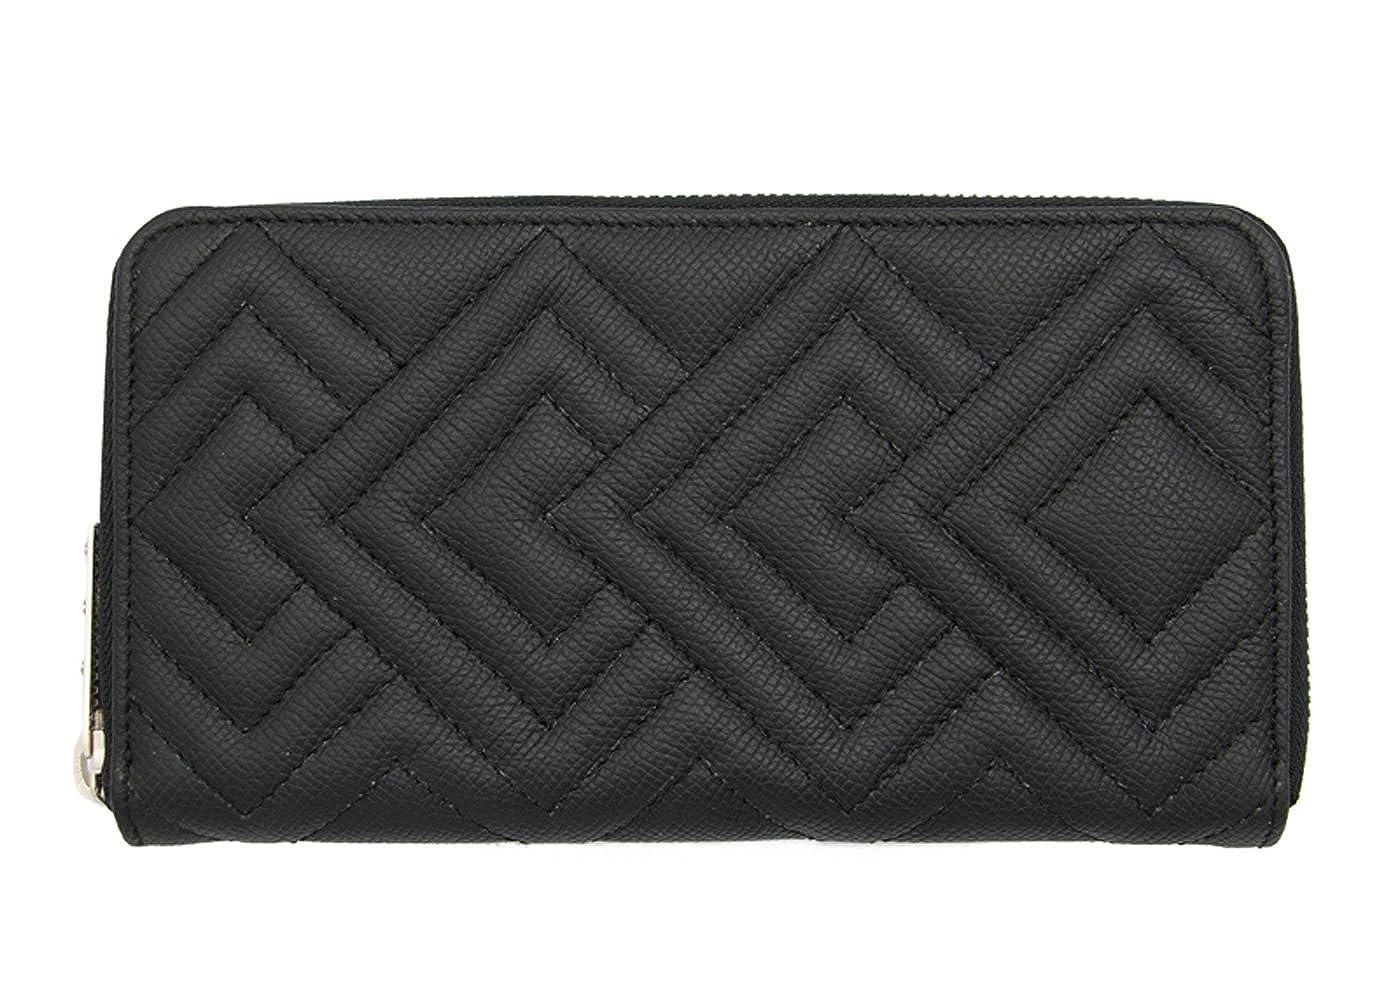 TSUNAIHAIYA ツナイハイヤ FRZWD 財布 / Fenomeno Round Zip Wallet Diamond / ラウンドジップウォレット L B07CK3277K 外装ブラック×内装ブラック